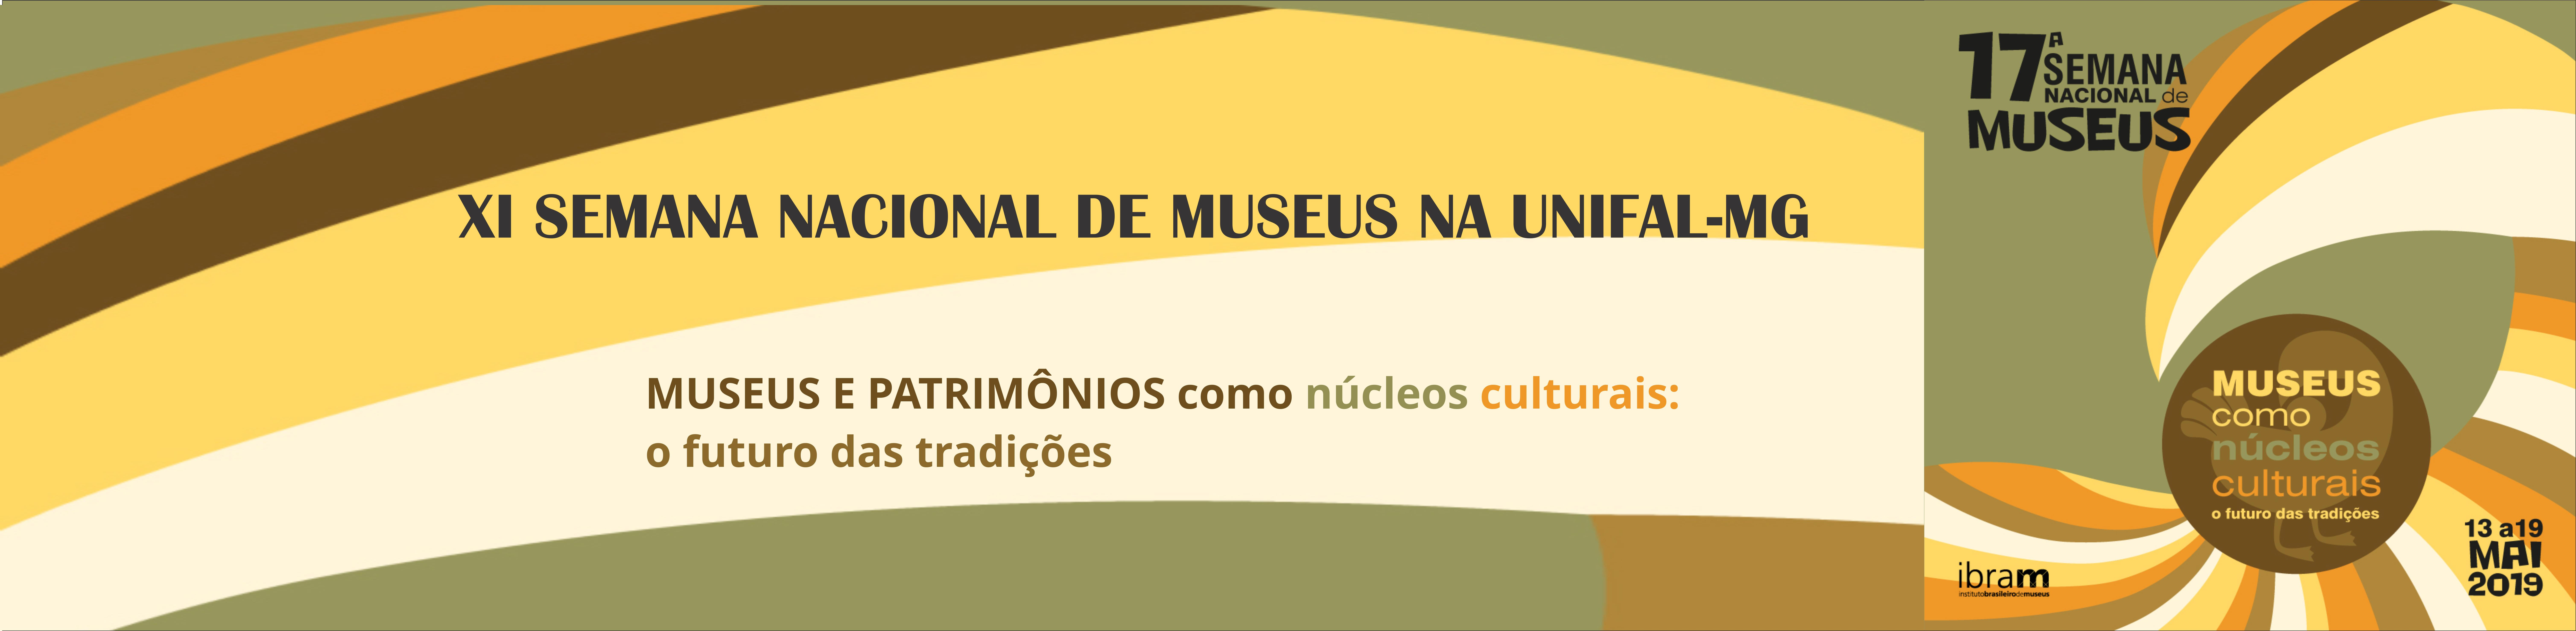 XI Semana Nacional de Museus da UNIFAL-MG